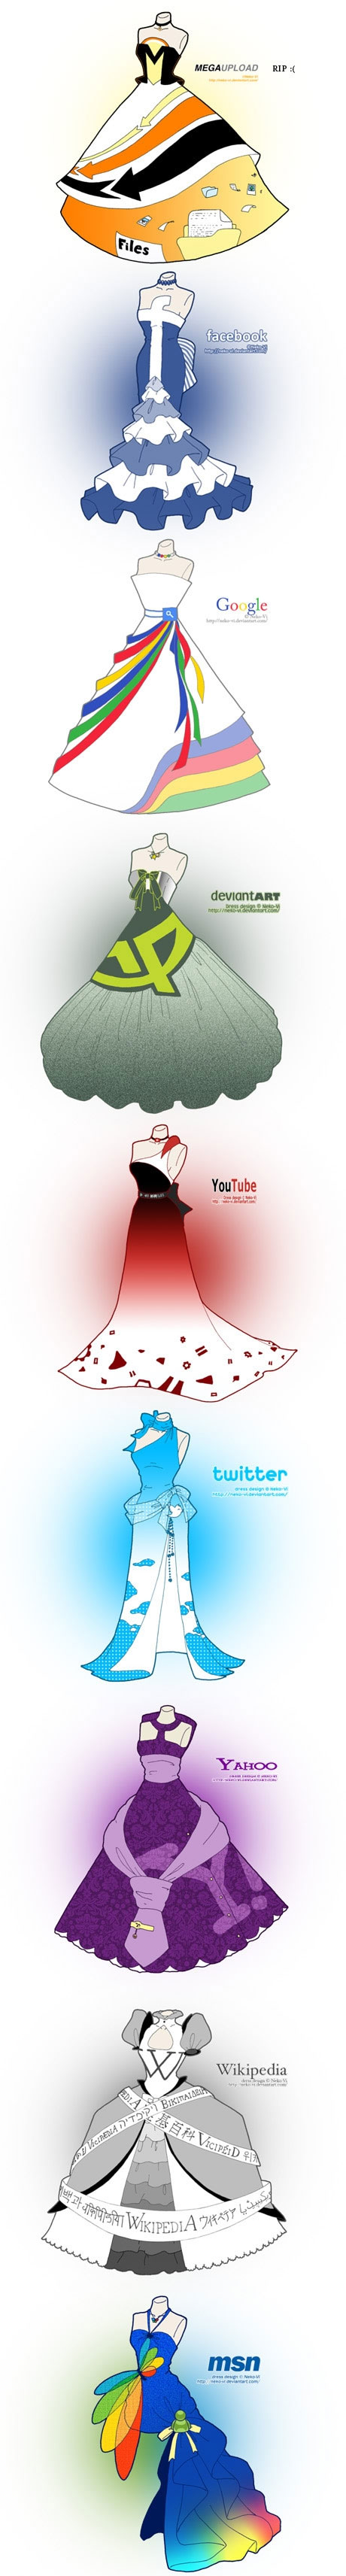 design robe de soiree site internet Google Yahoo MSN Facebok Victor Faretina